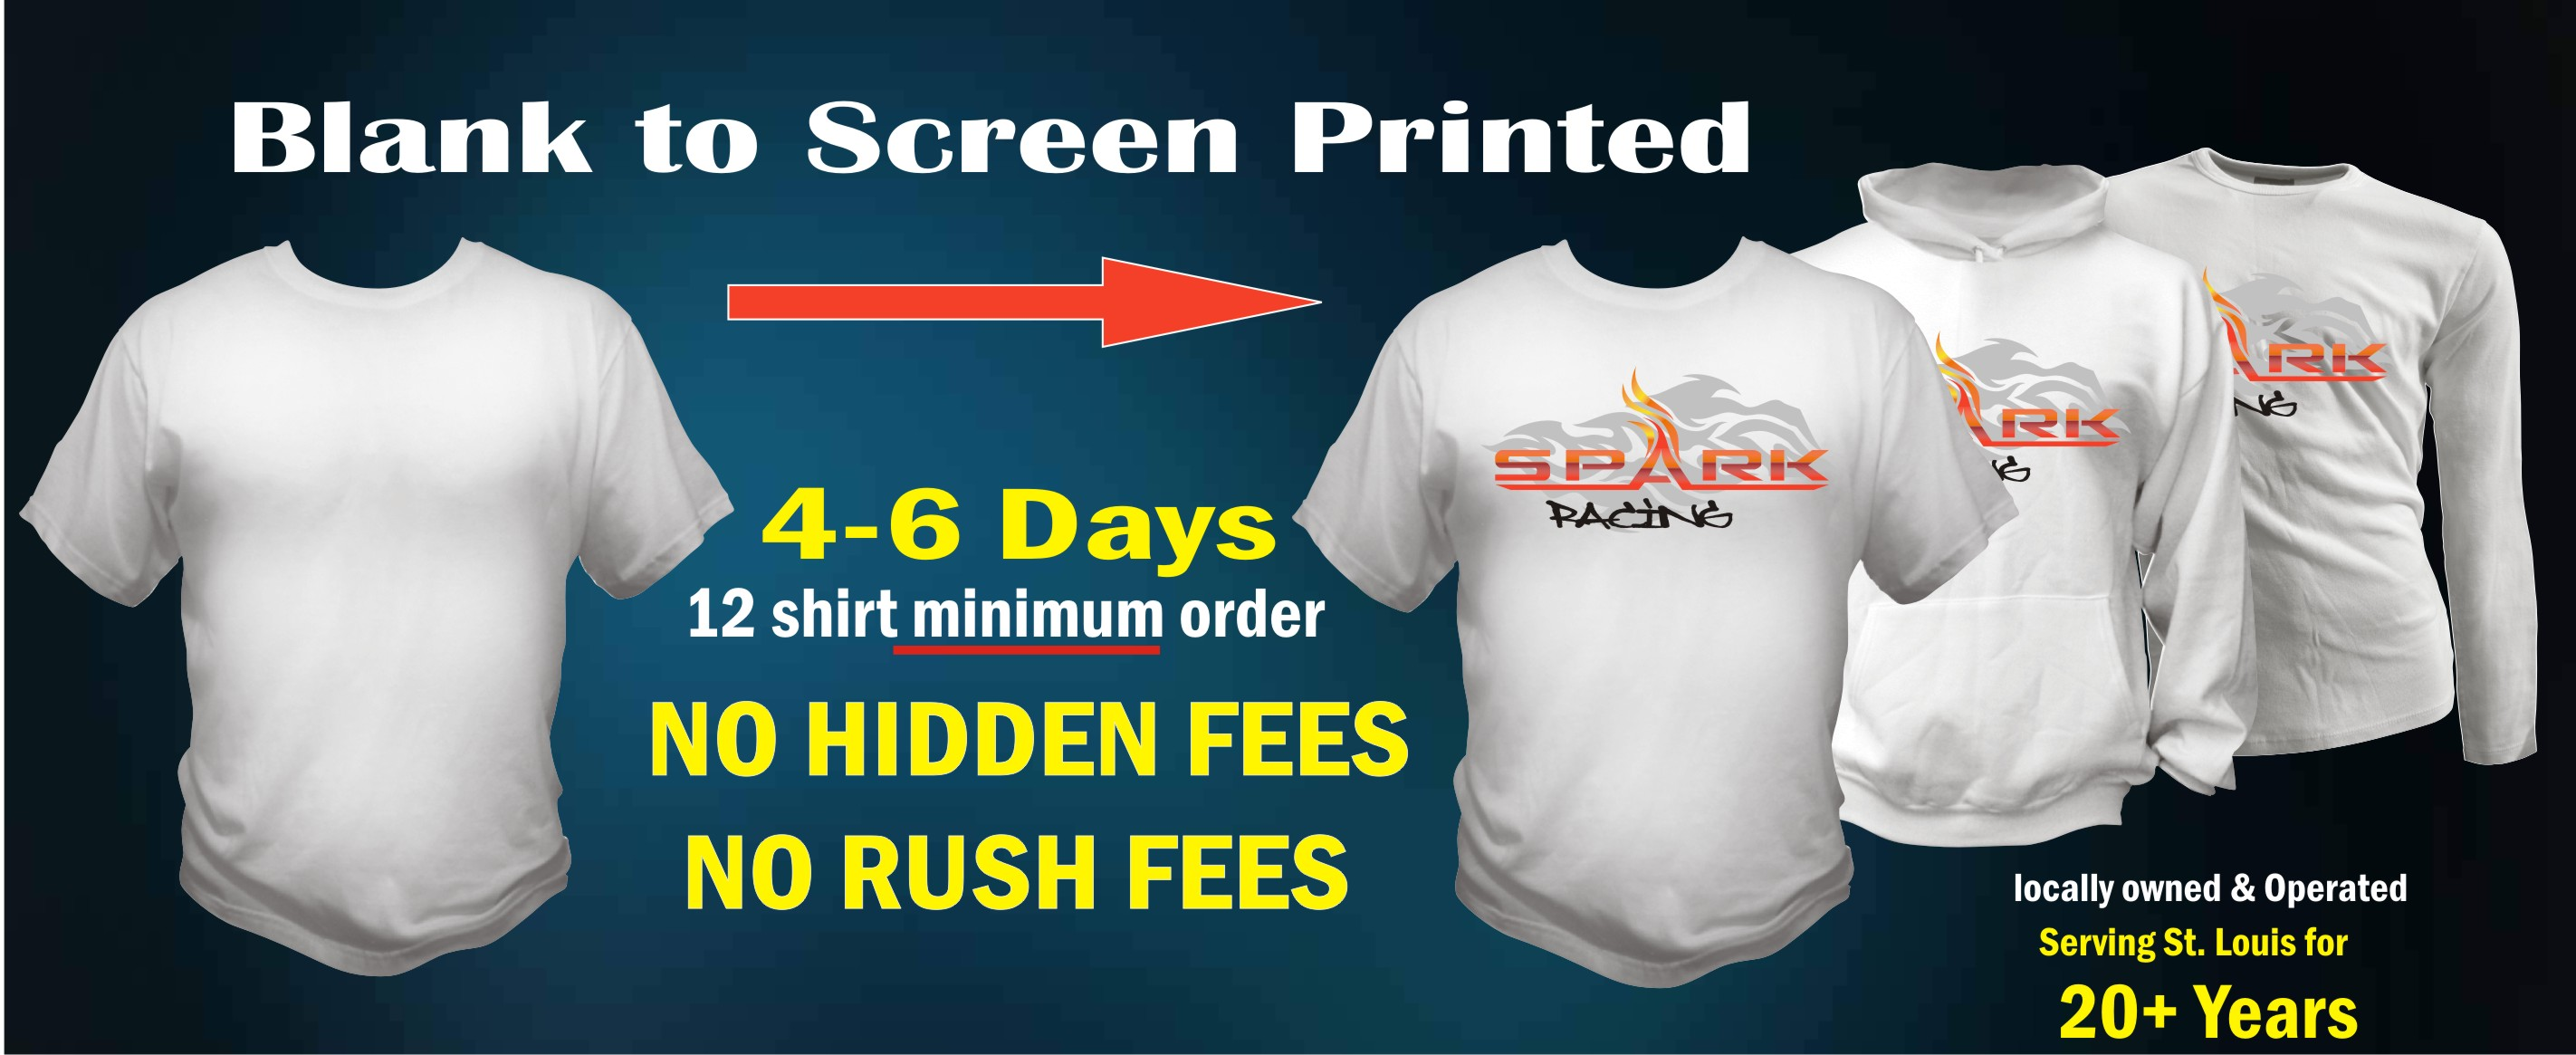 Kirkwoood trading company custom t shirts st louis for St louis t shirt printing